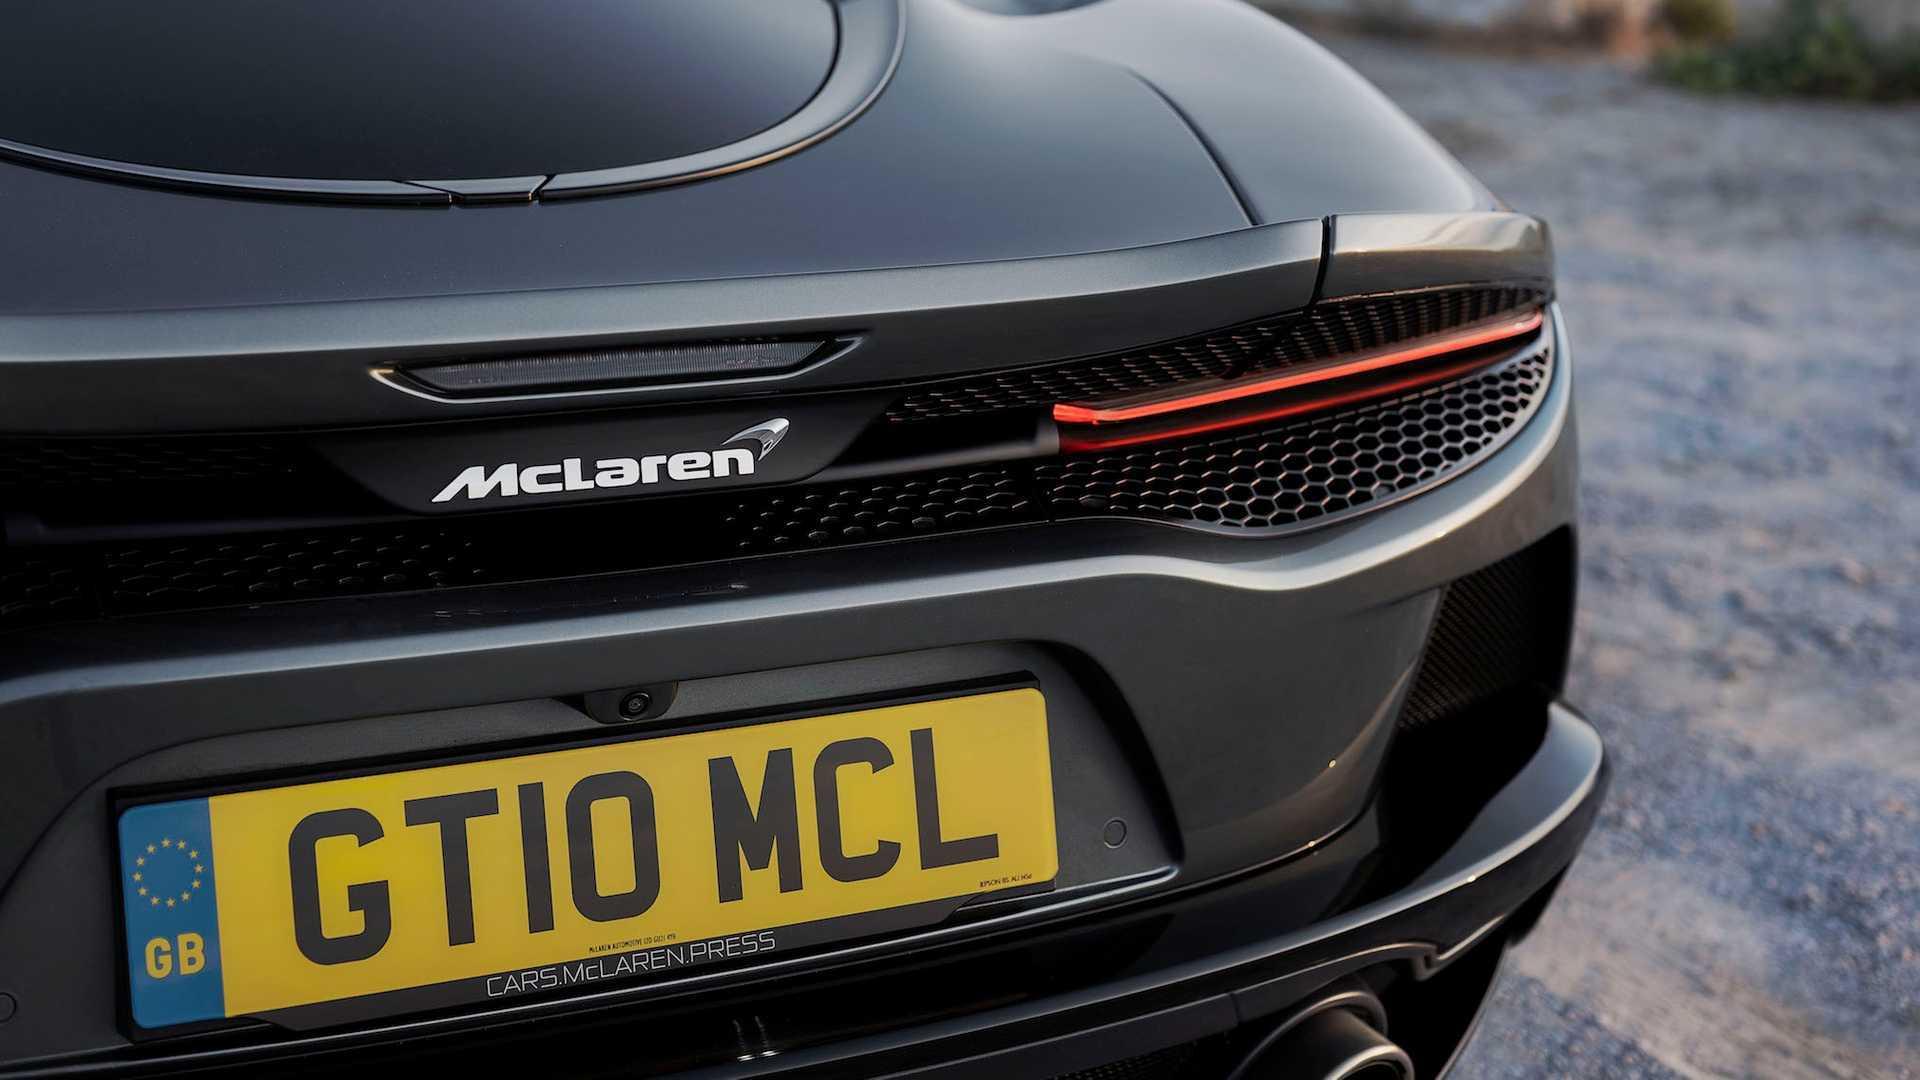 McLaren To Axe 1,200 Jobs, More Than A Quarter Of Its Workforce